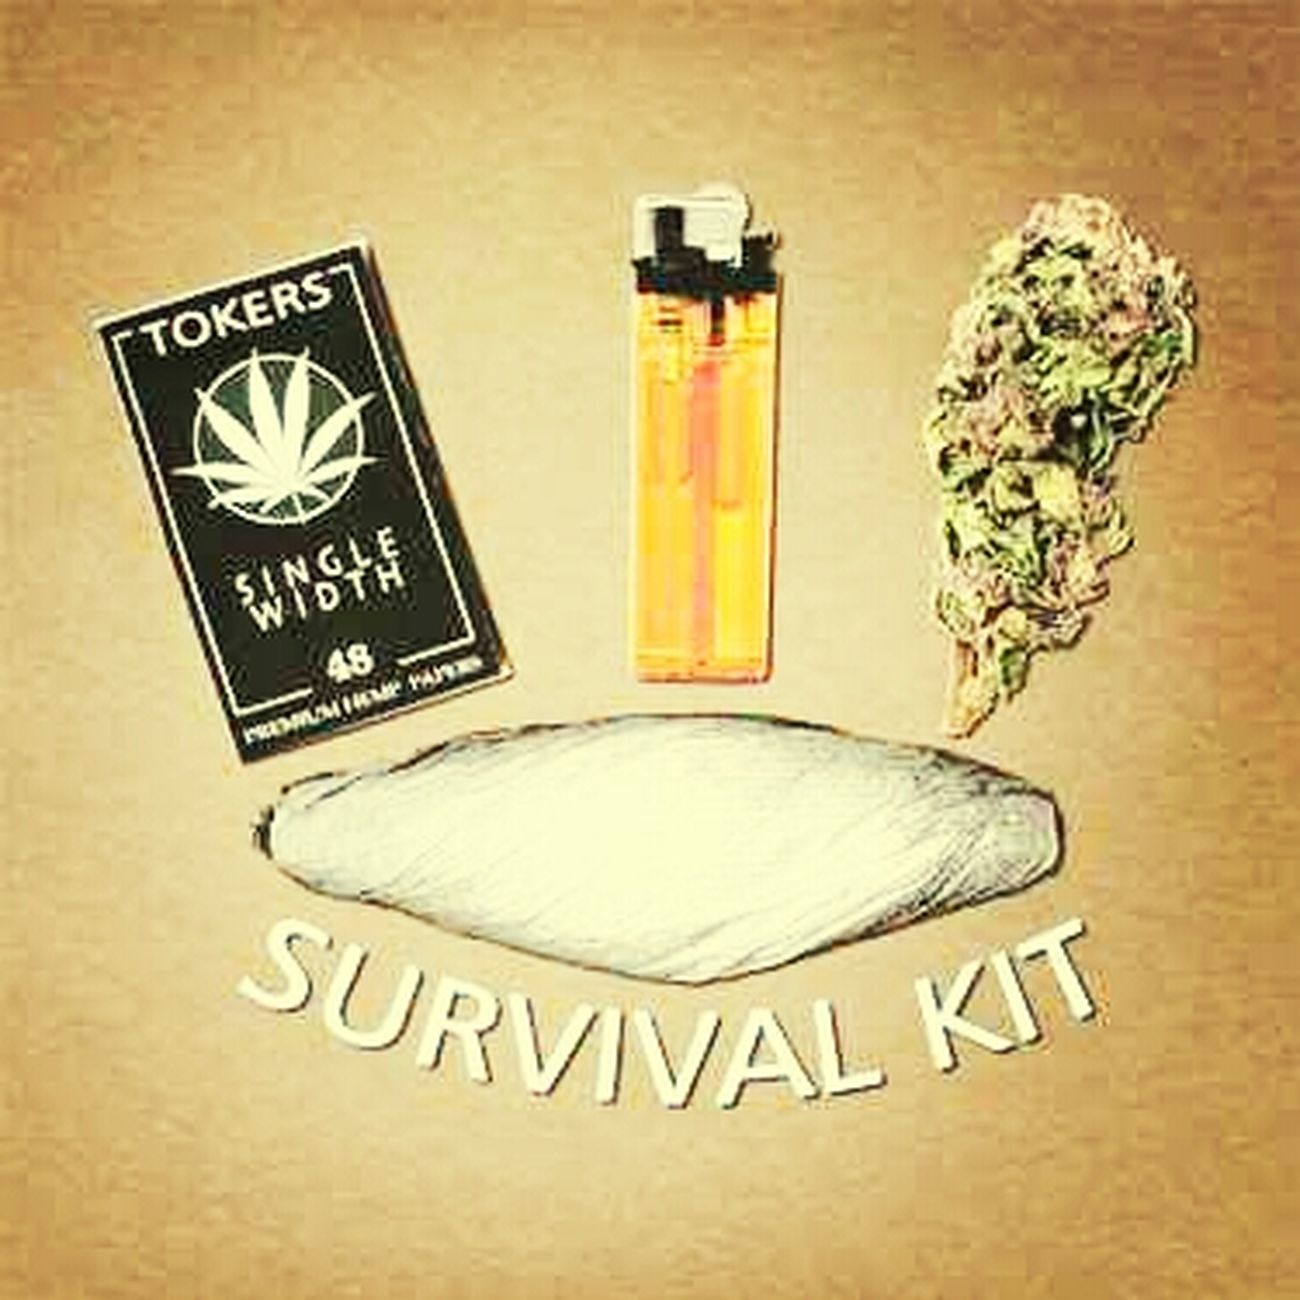 all I need to survive. fuck life. get highhhh. Weed Marijuana Mary Jane Got Green? Smoke Some LOL